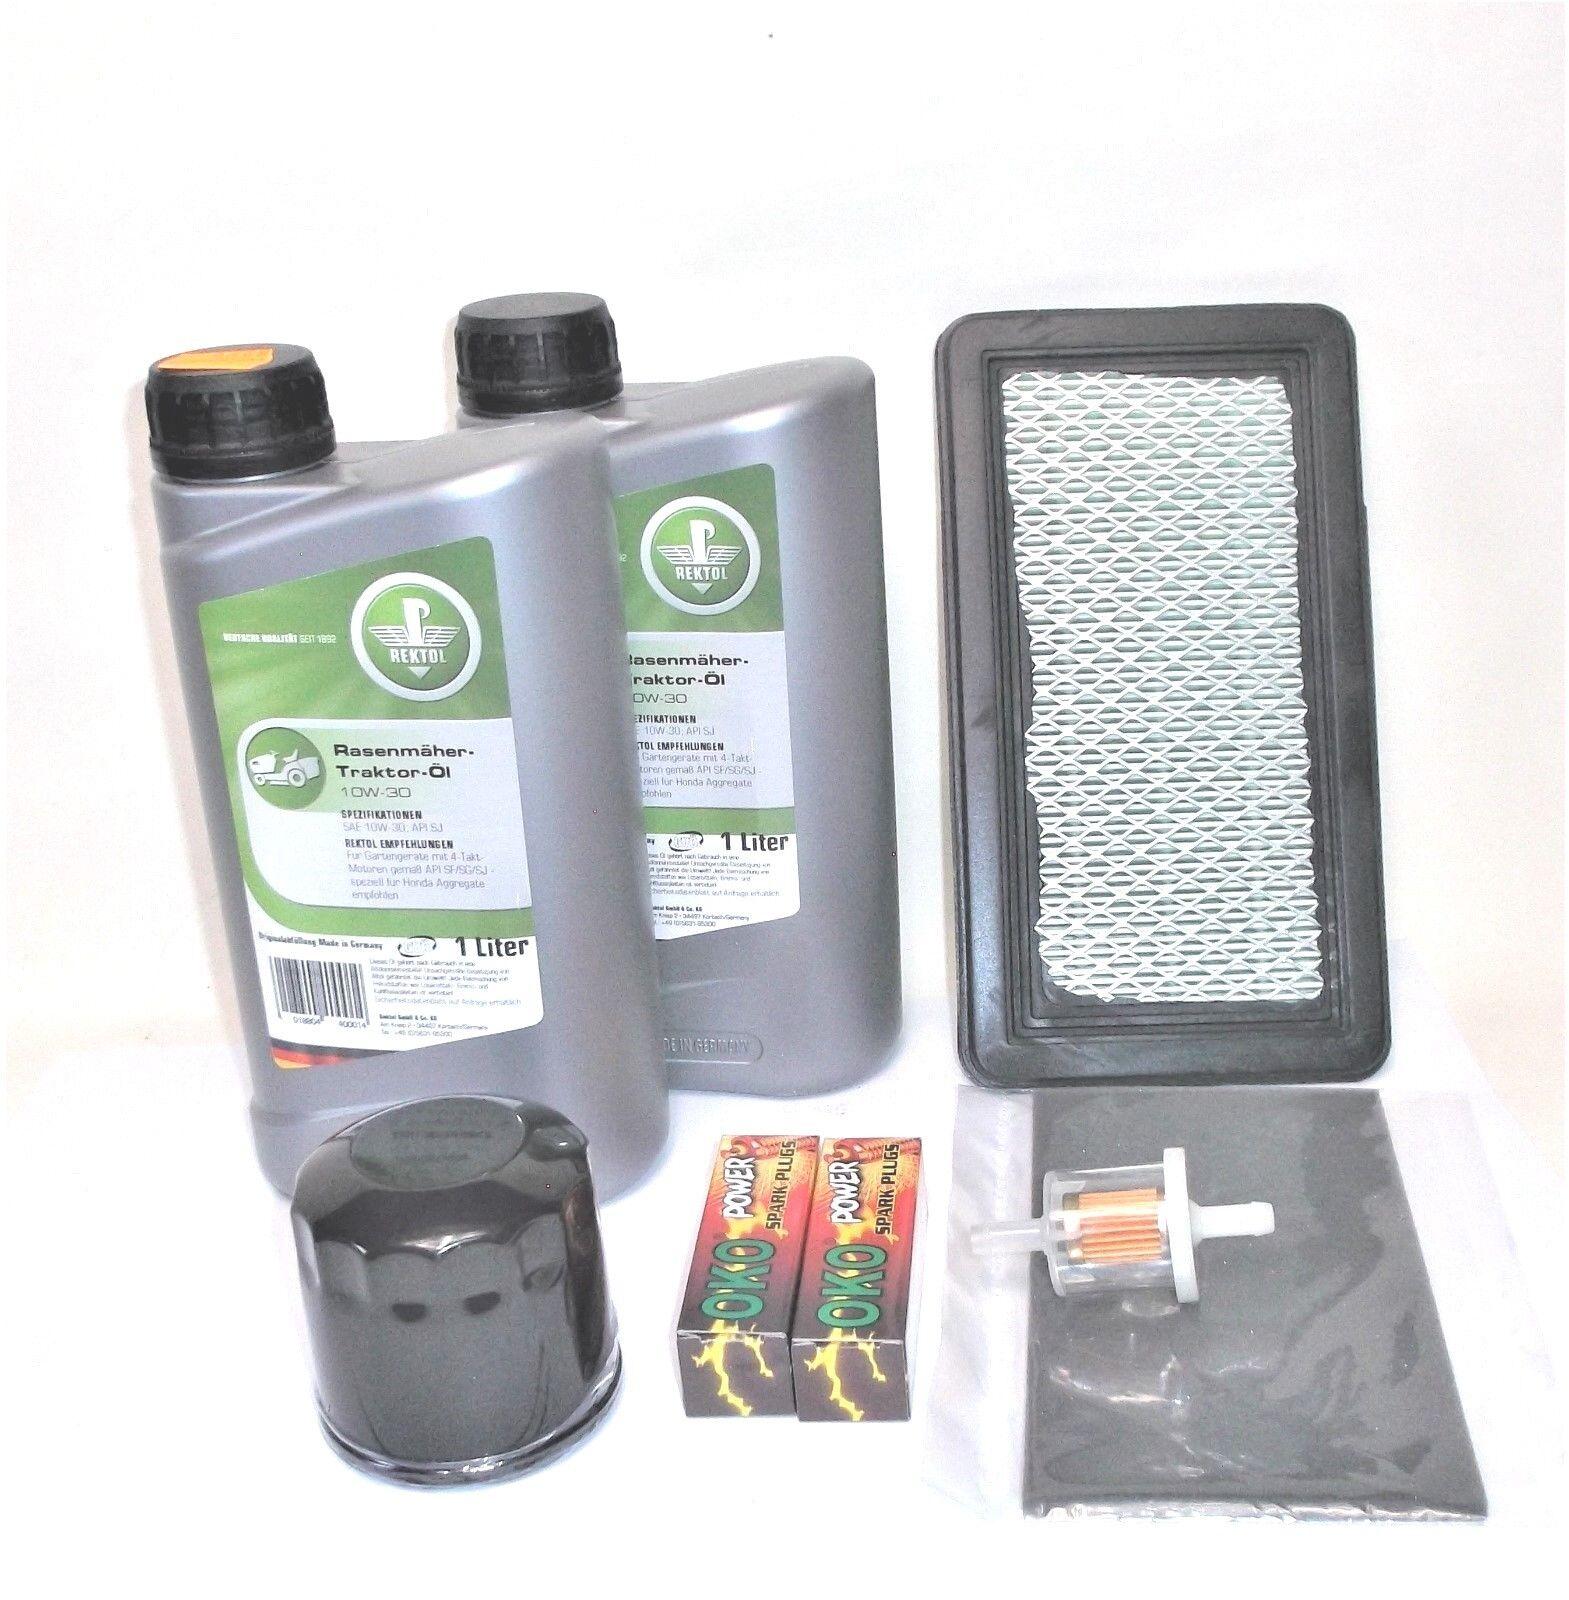 Service-kit para honda hf2315, hf2415, hf2417, hf2214, hf2216, gcv 520, gcv 530